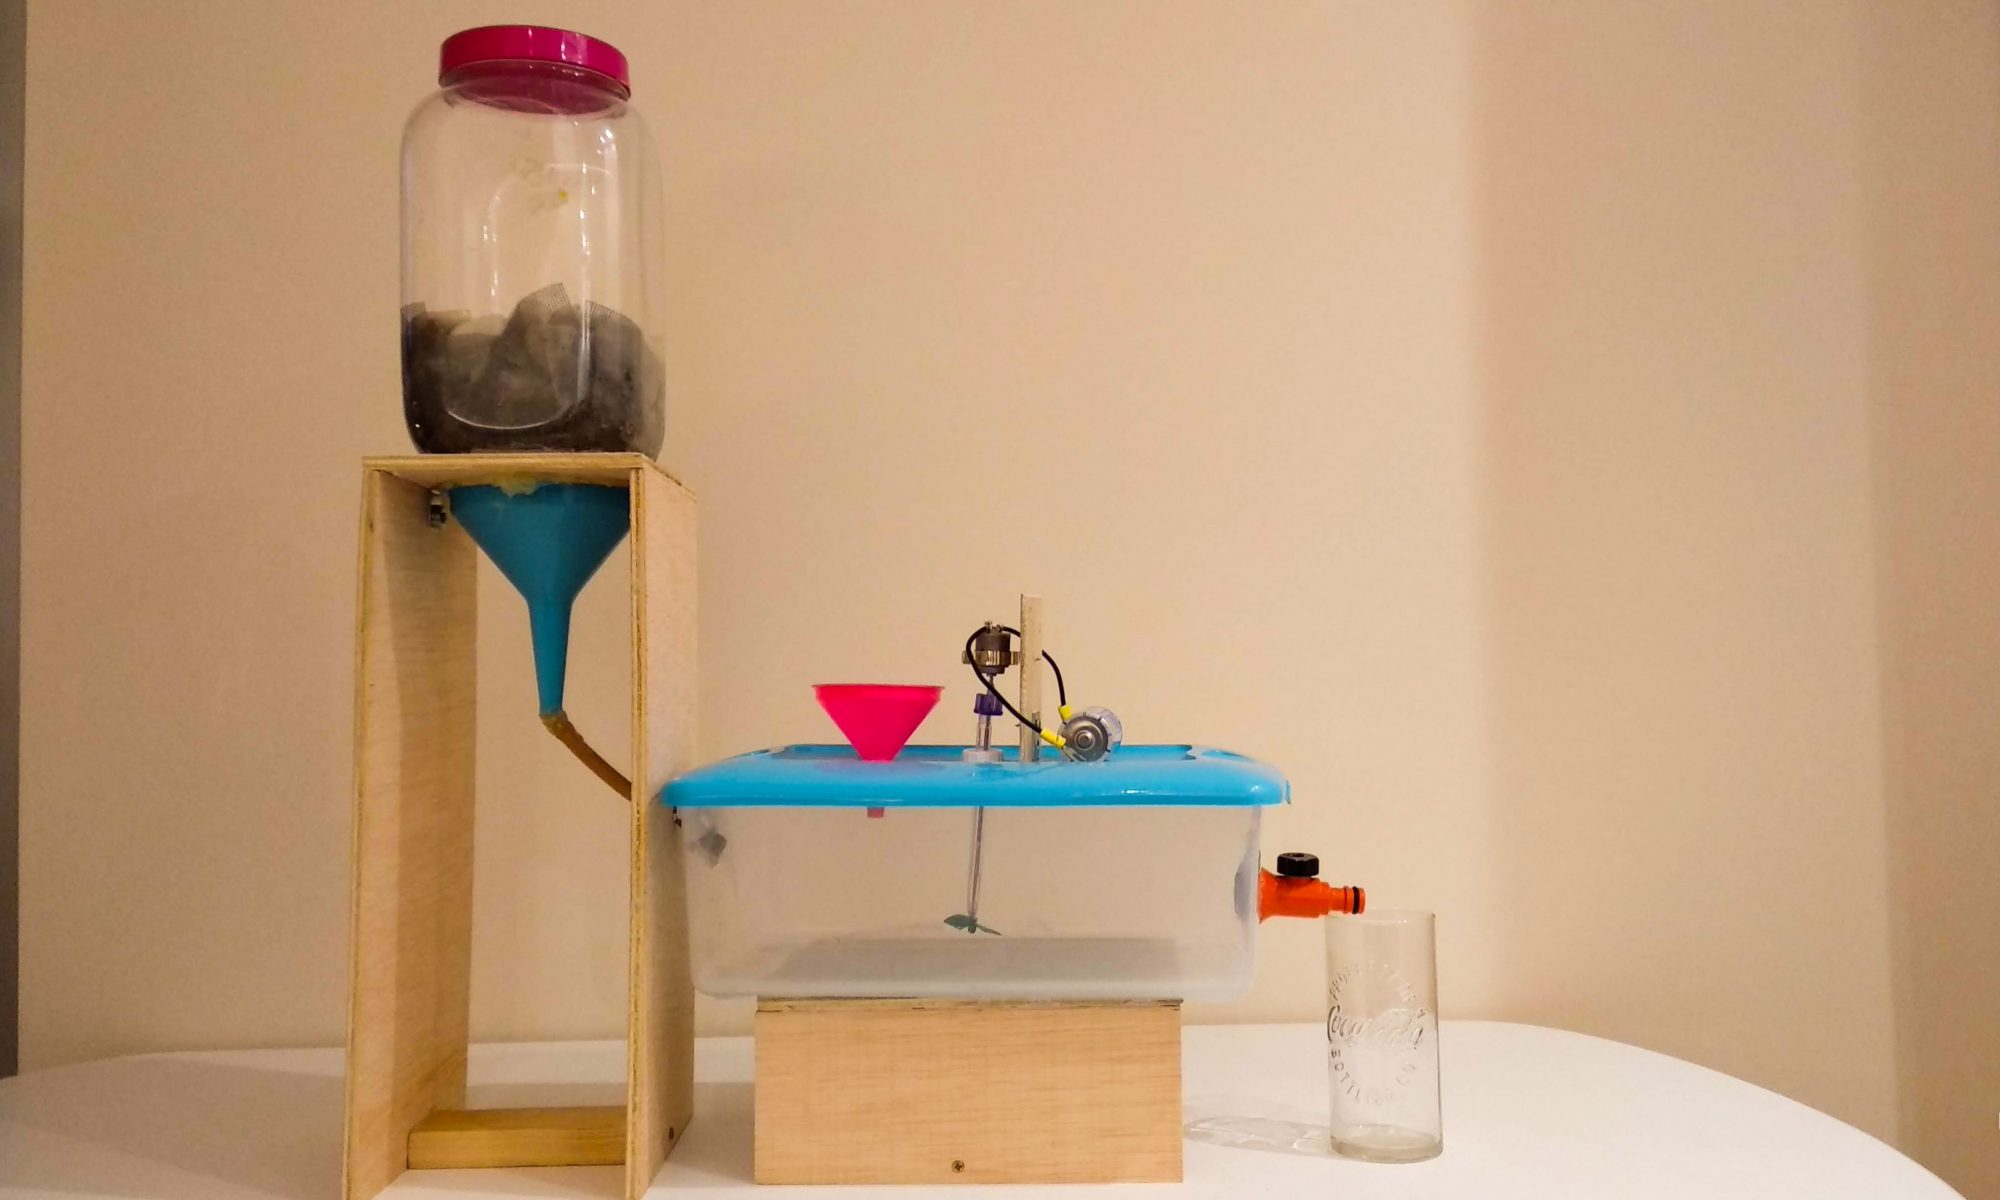 Depuración Microbiológica de Aguas Residuales